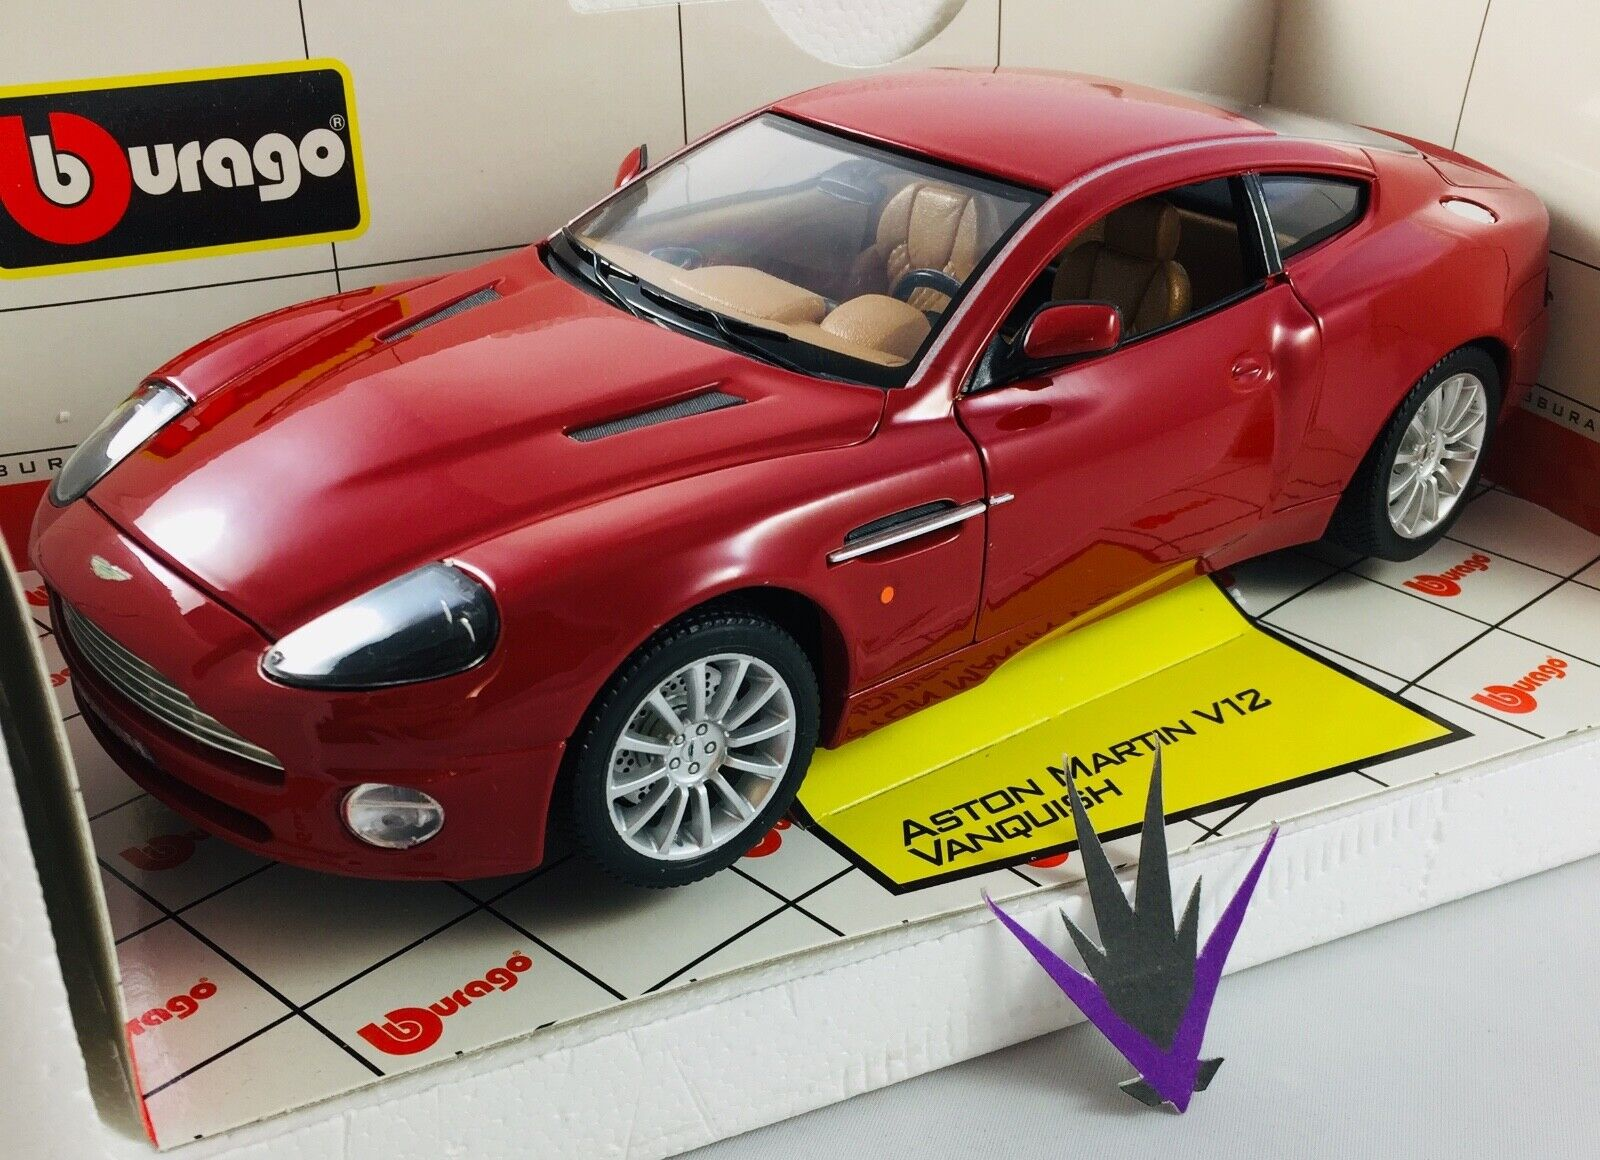 Bburago Aston Iron Hammer Wedges V12 Vanquish 1 18 with Box